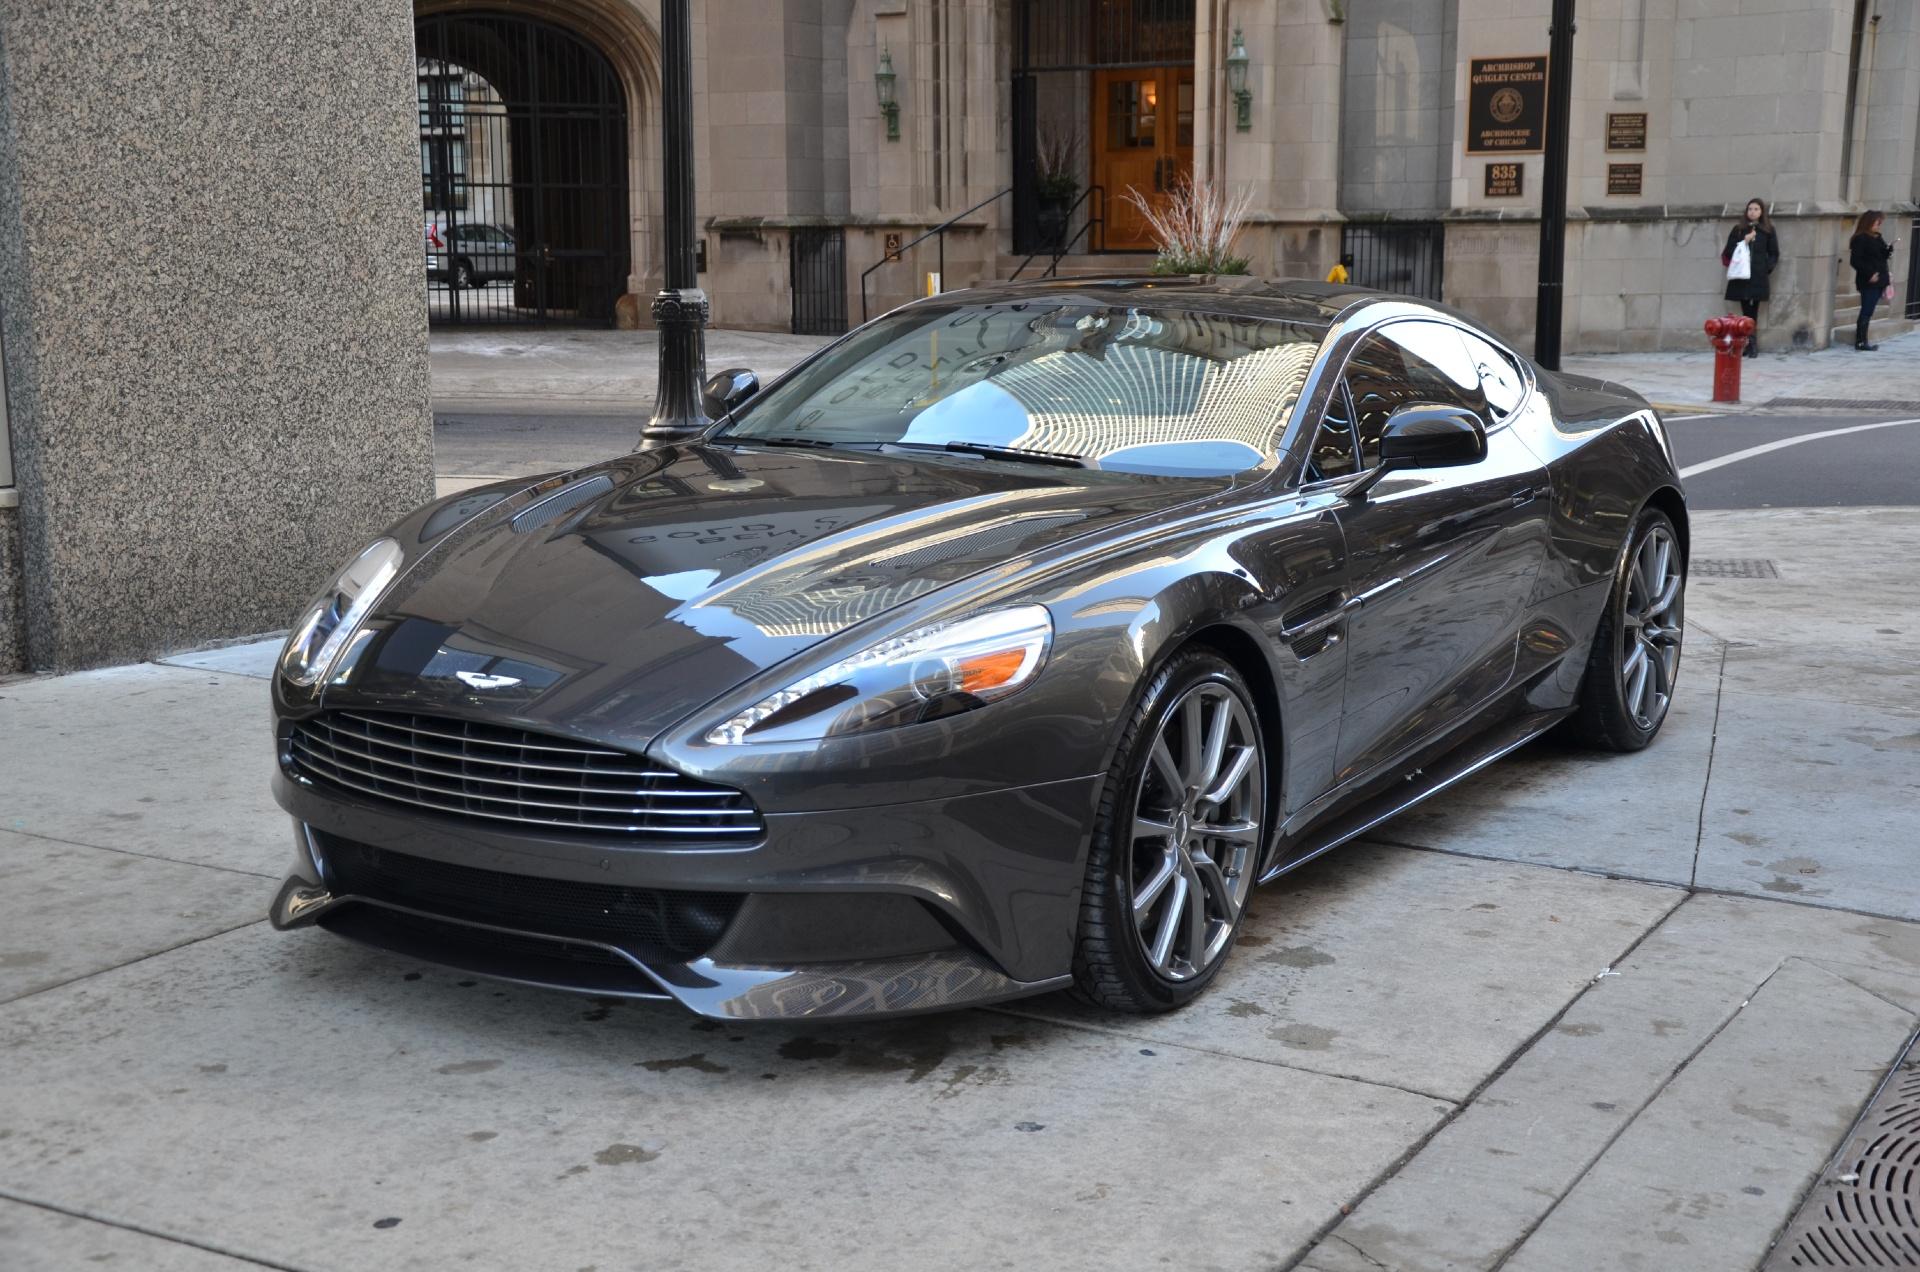 Aston Martin Stock >> 2014 Aston Martin Vanquish Stock L254a For Sale Near